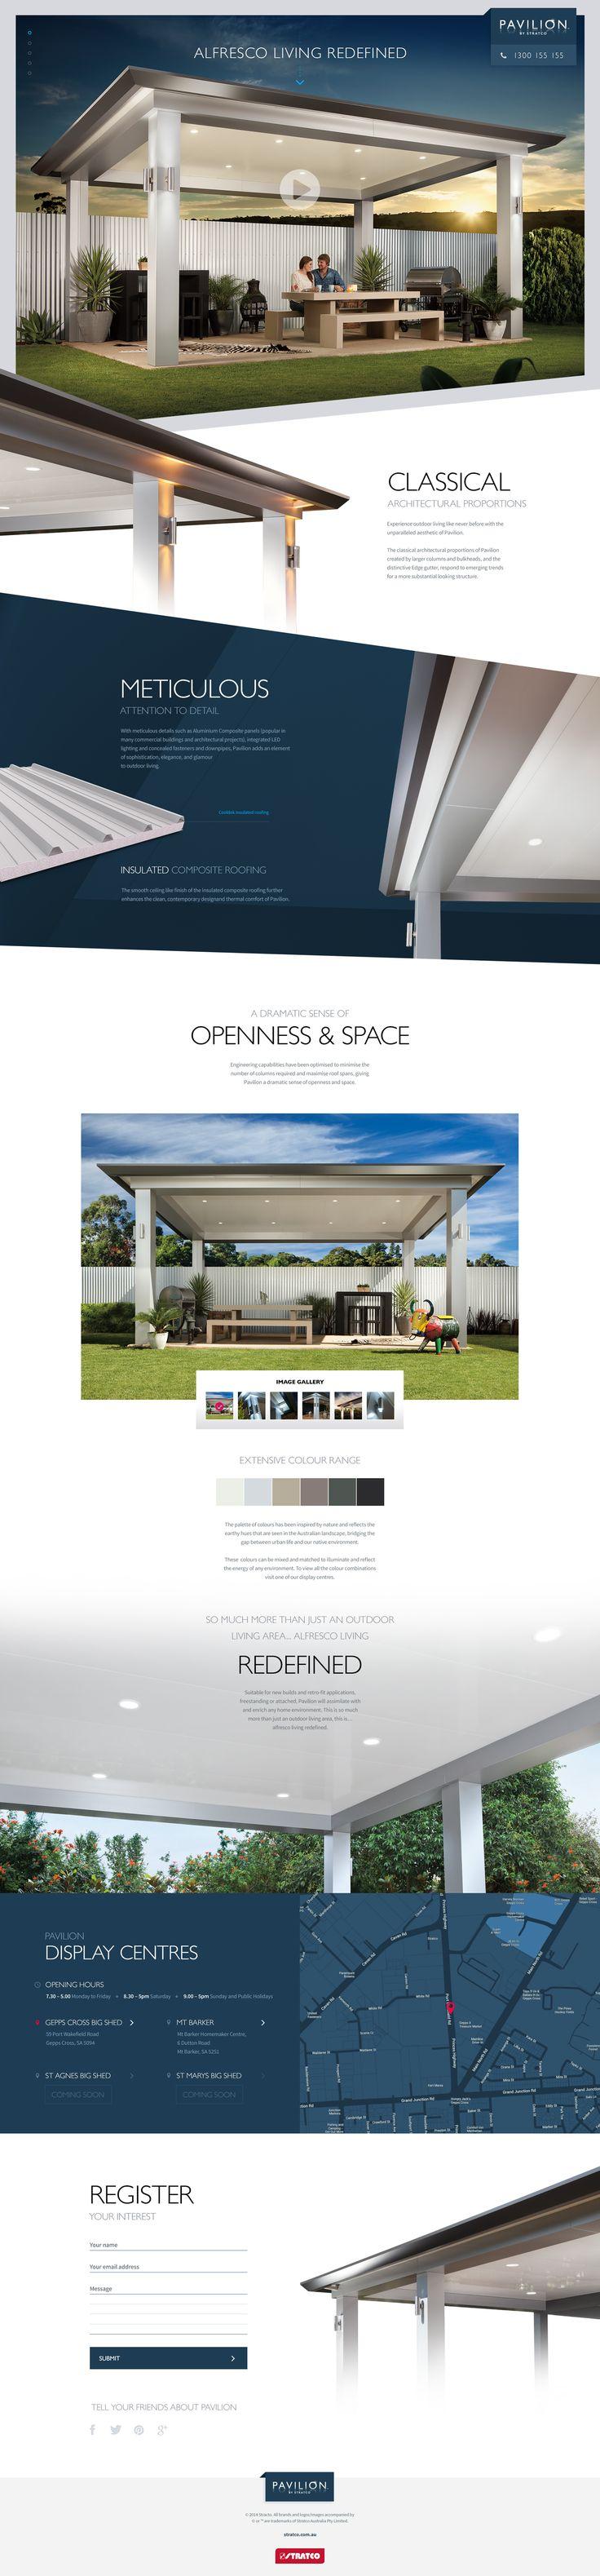 Pavilion Website #UI